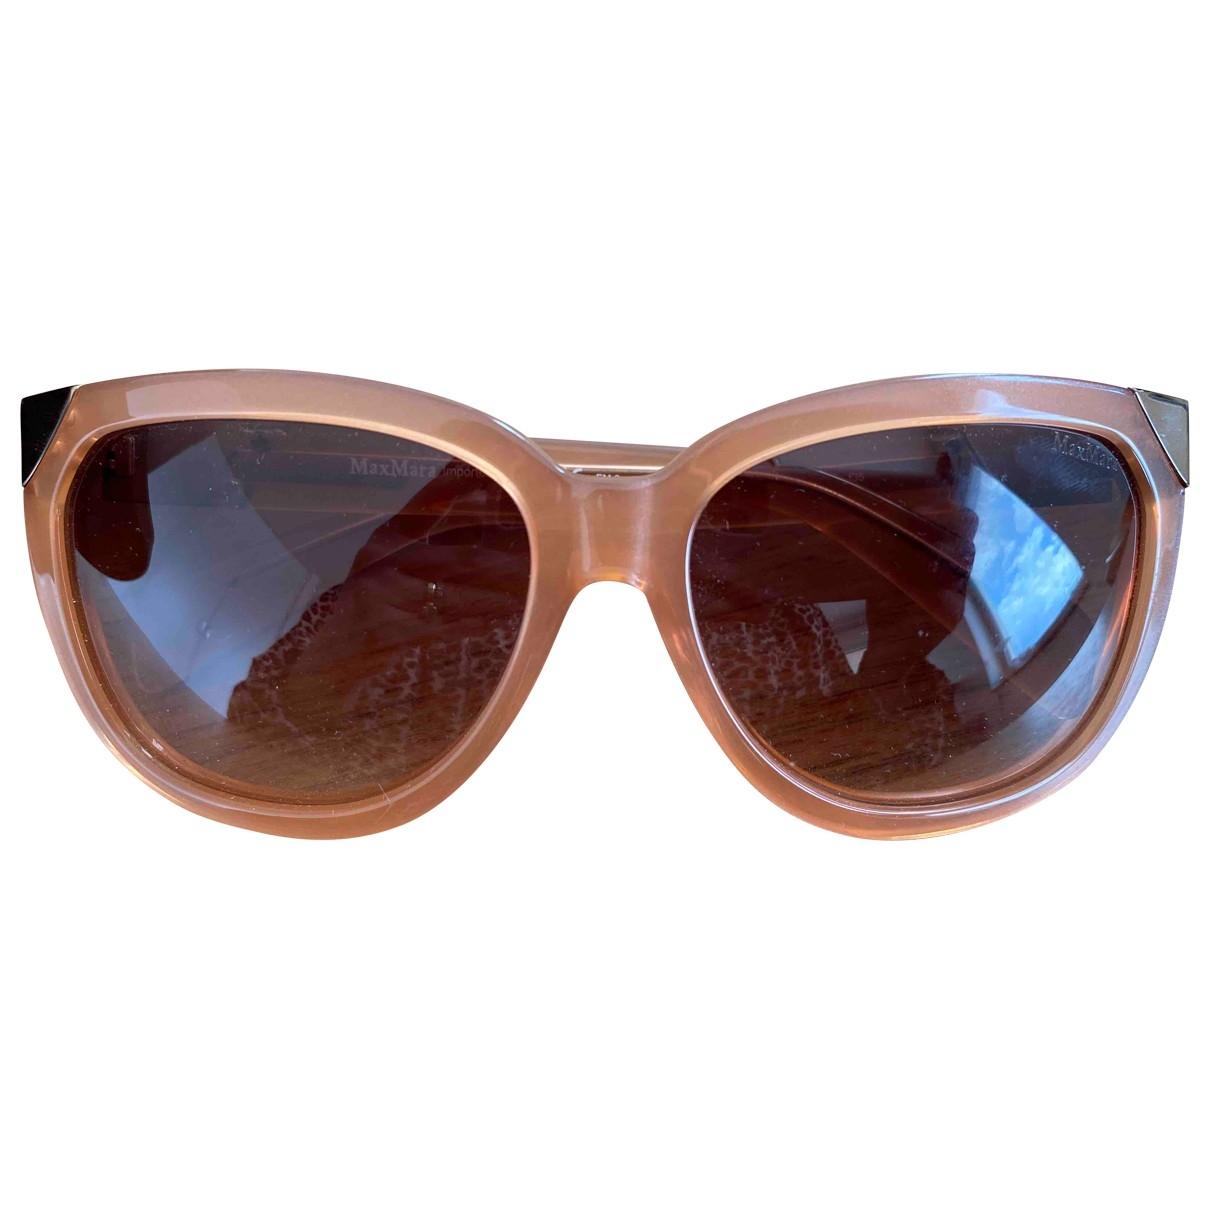 Max Mara \N Pink Sunglasses for Women \N